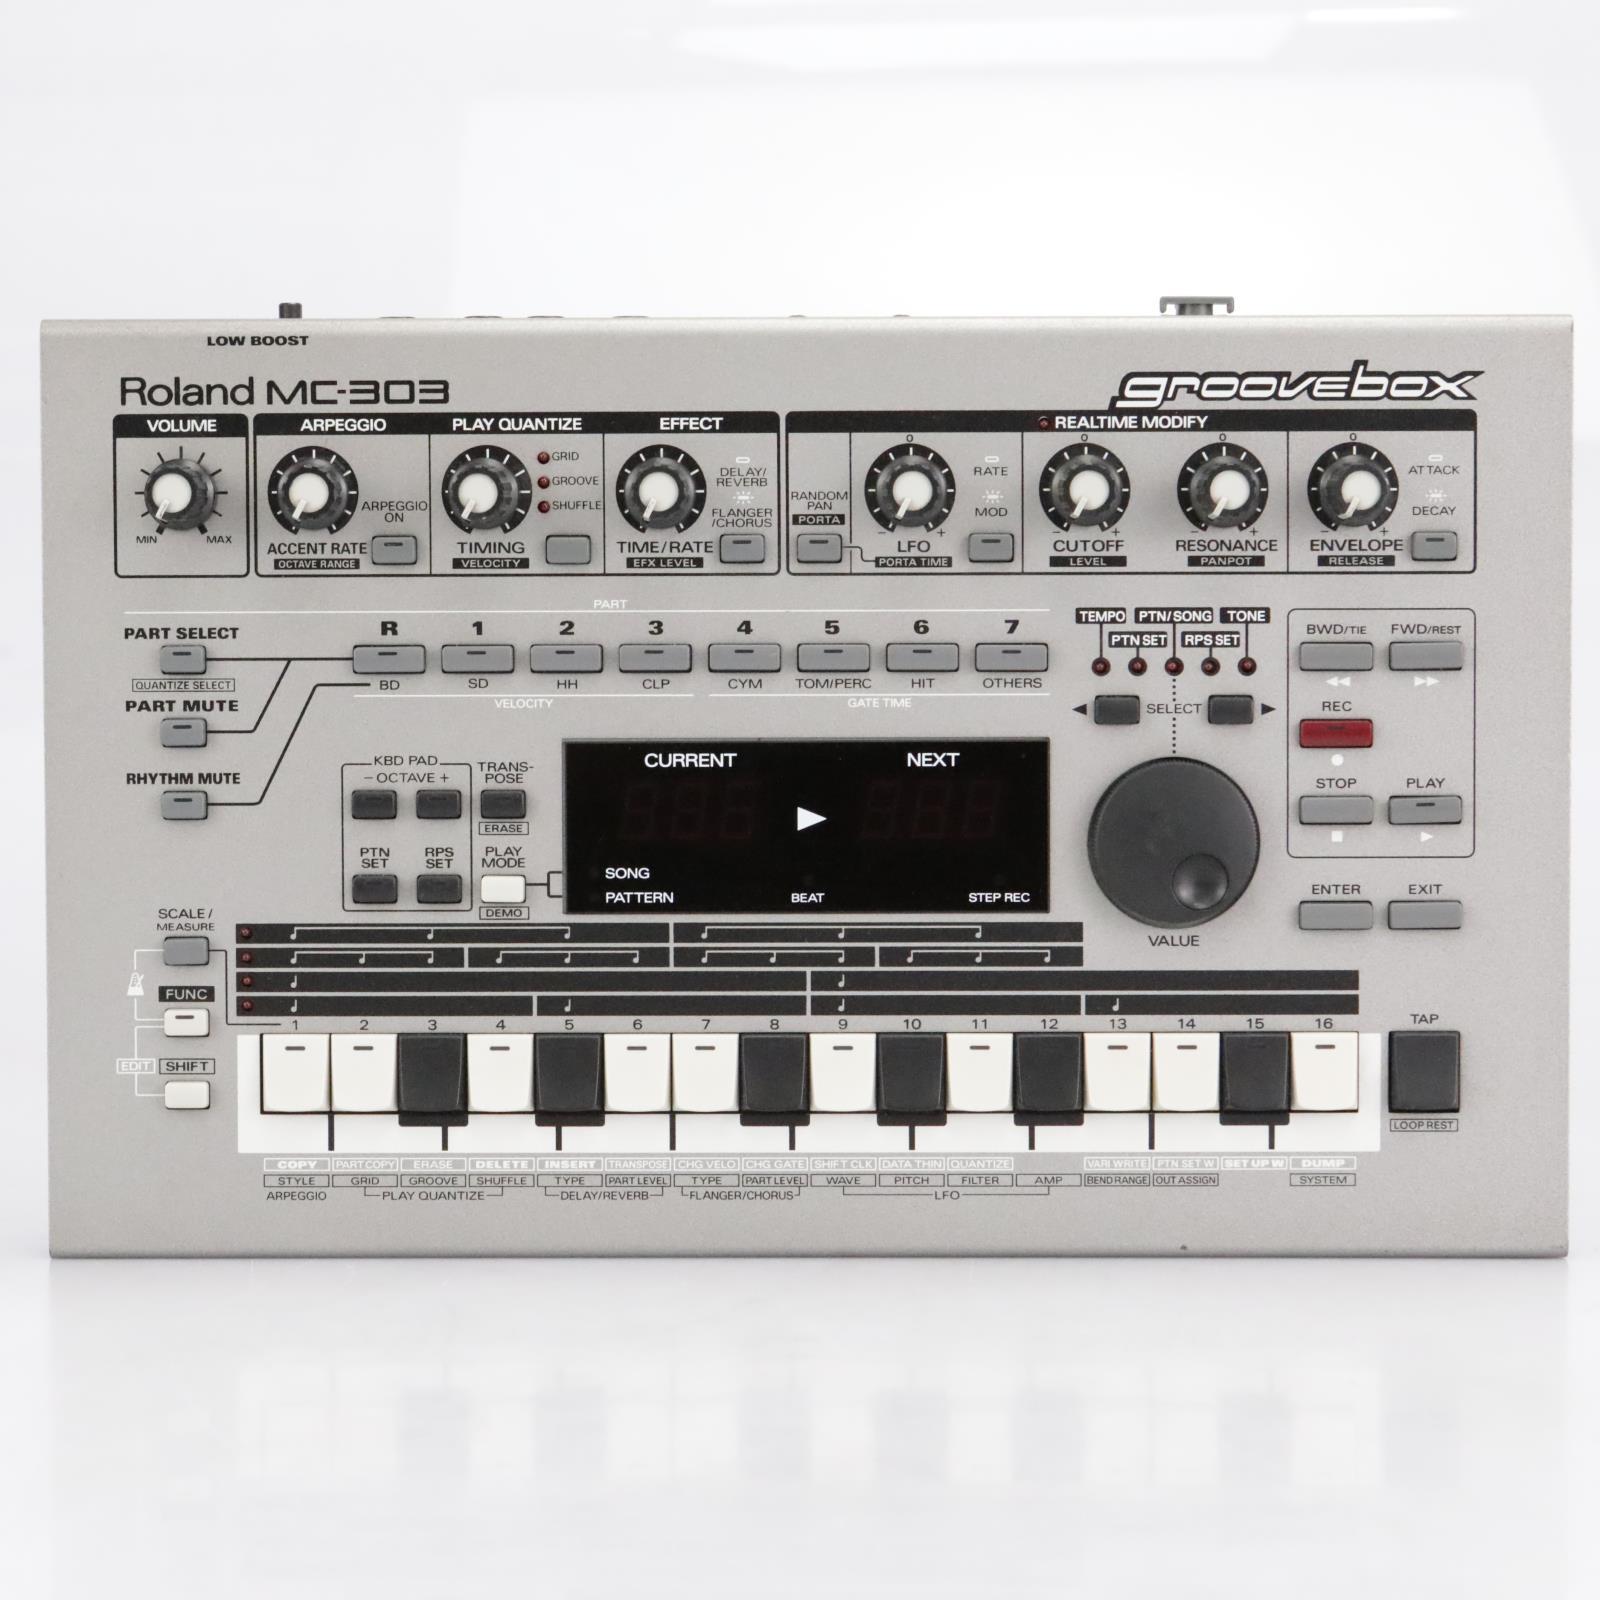 Roland MC-303 Groovebox Sequencer Sound Module #41964